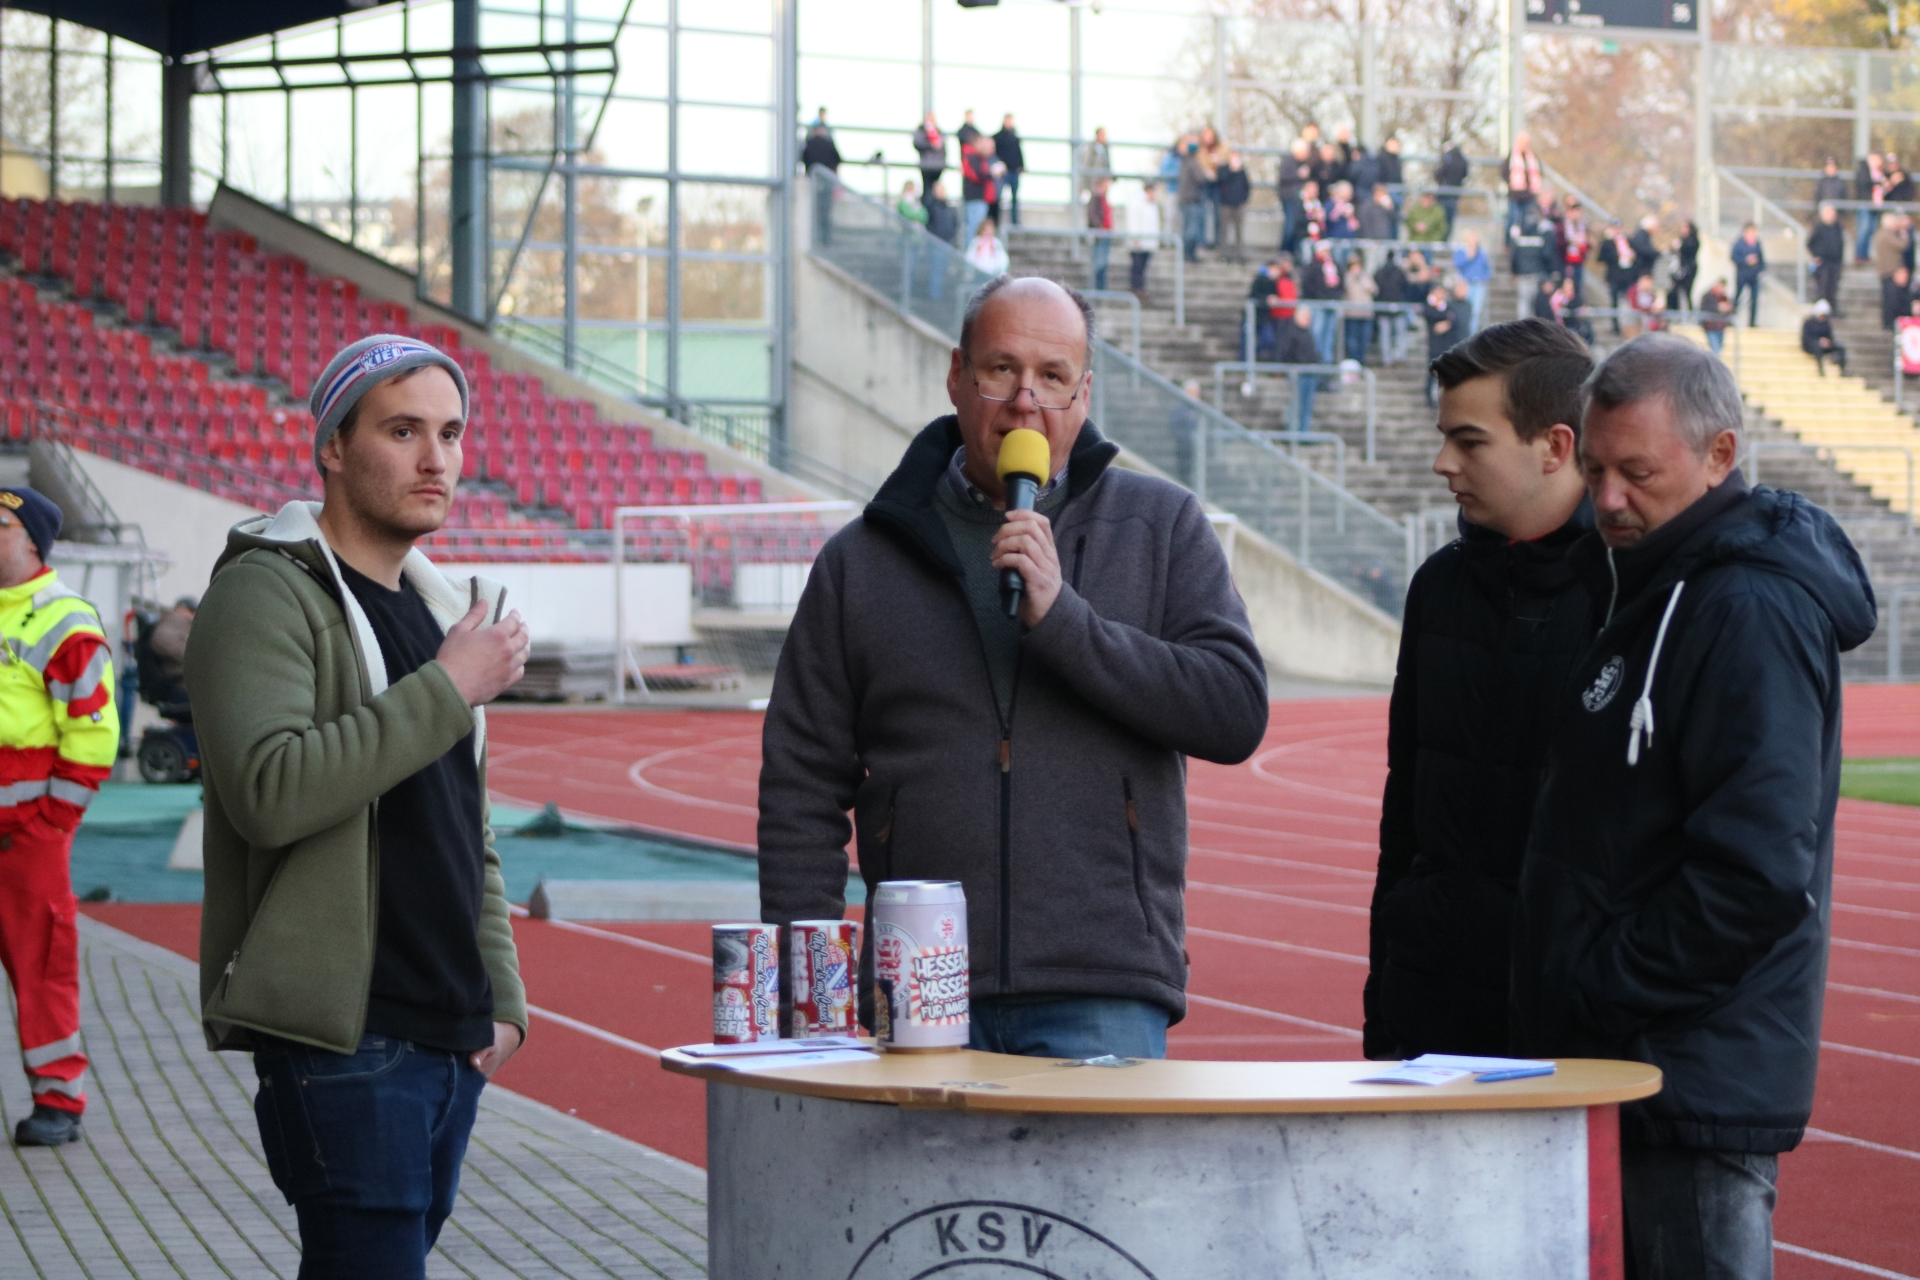 Lotto Hessenliga 2019/2020, KSV Hessen Kassel, SC Waldgirmes, Endstand 4:1.